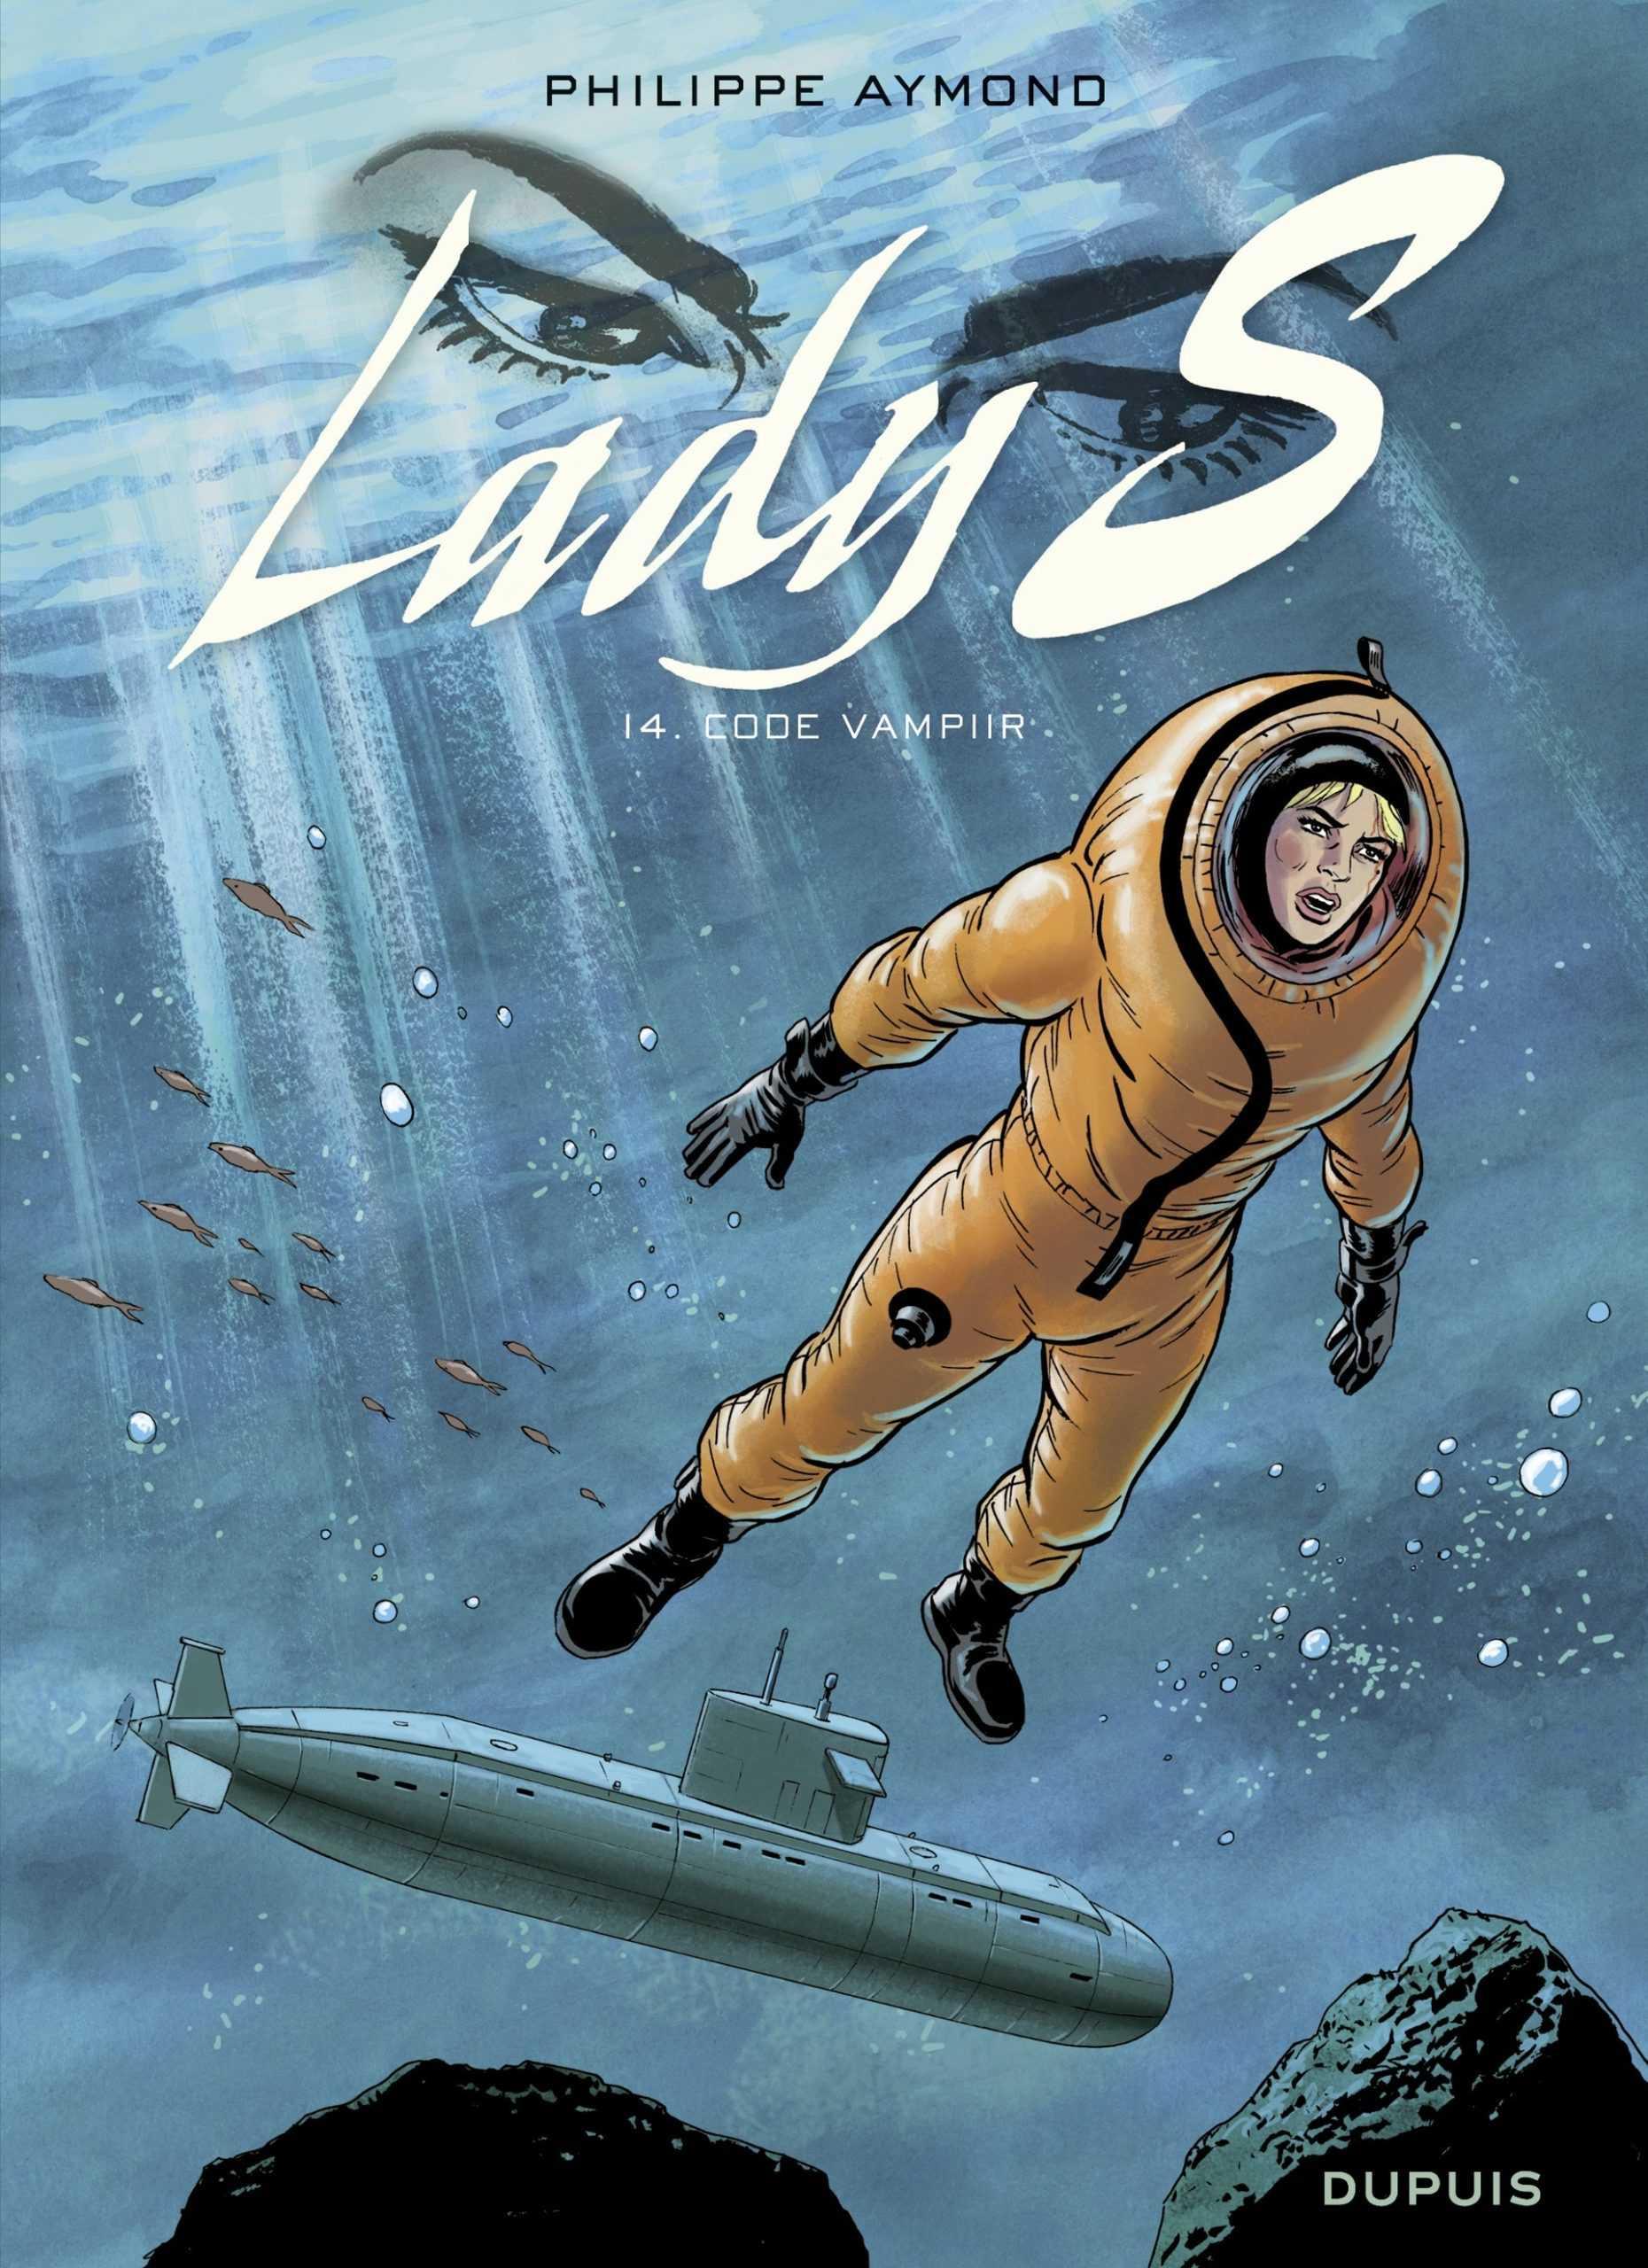 Lady S, un tome 14 où Aymond rebat les cartes